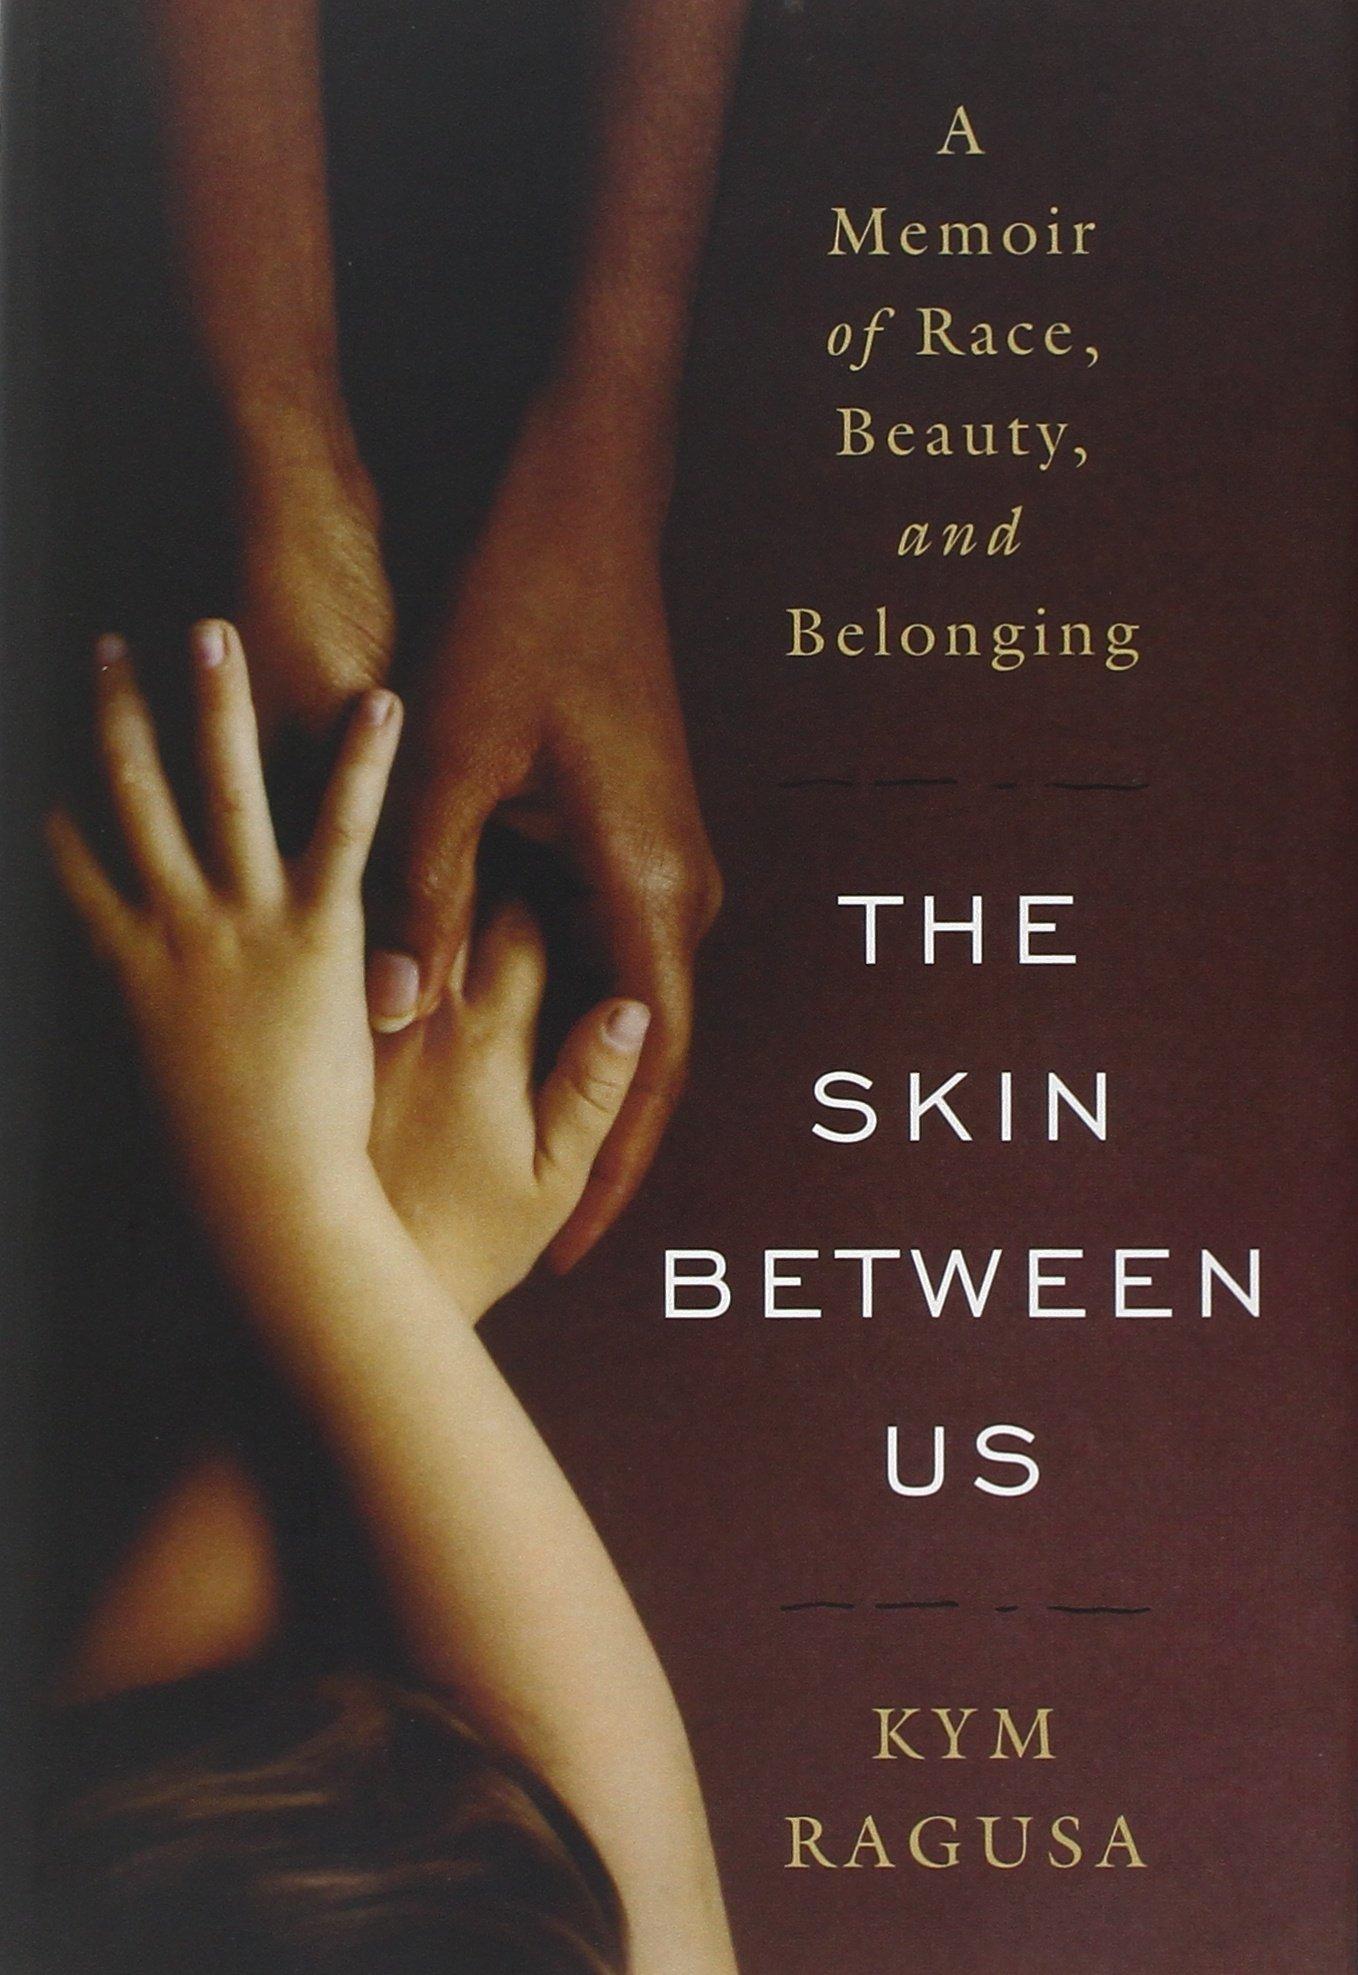 The Skin Between Us: A Memoir of Race, Beauty, and Belonging ebook